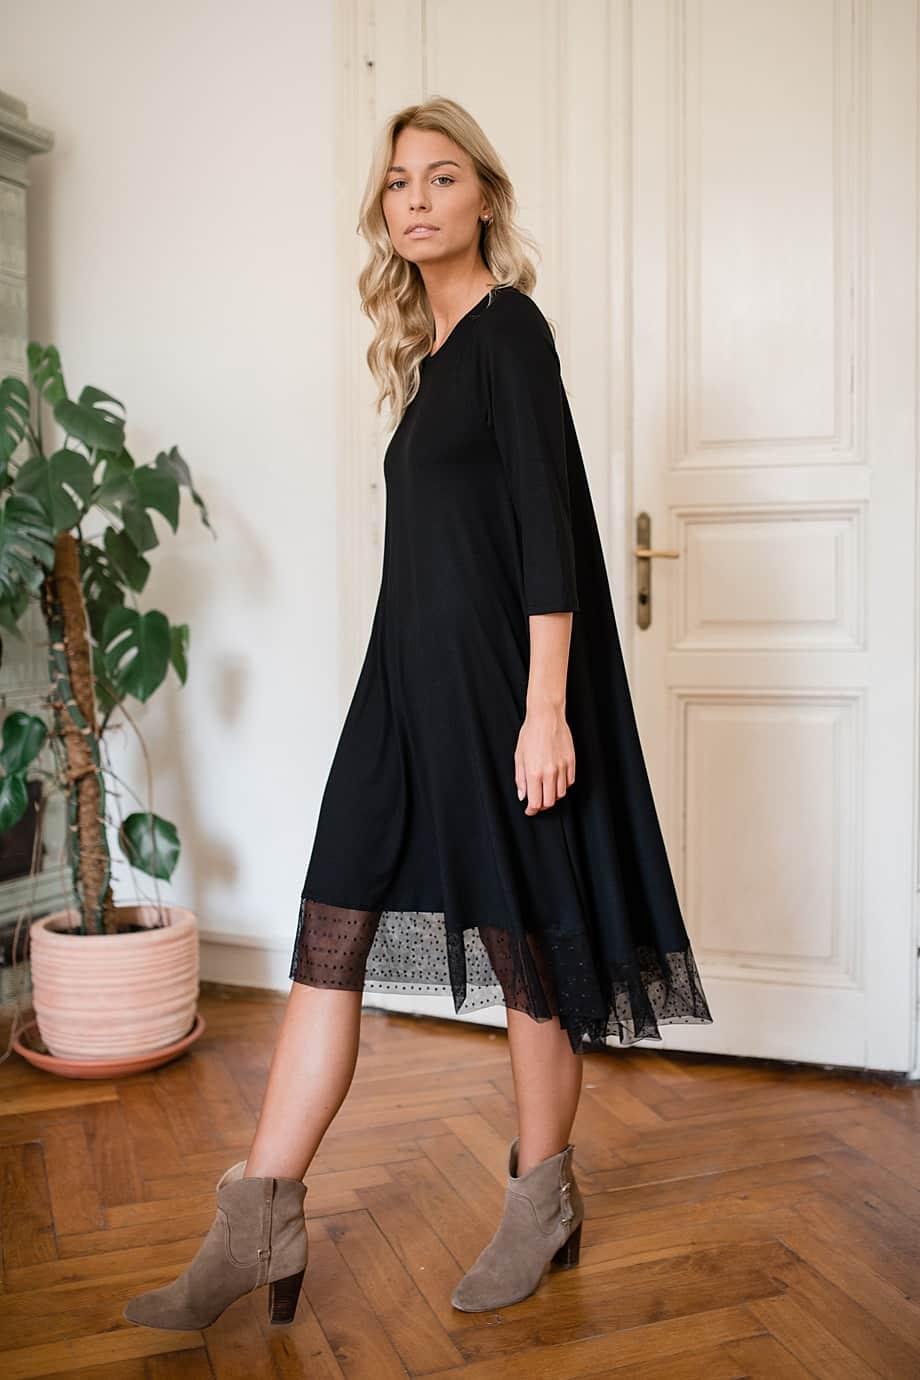 Haljina Jana - 95% viskoza - 5% elastin - 790kn - onesize - LuLu Couture